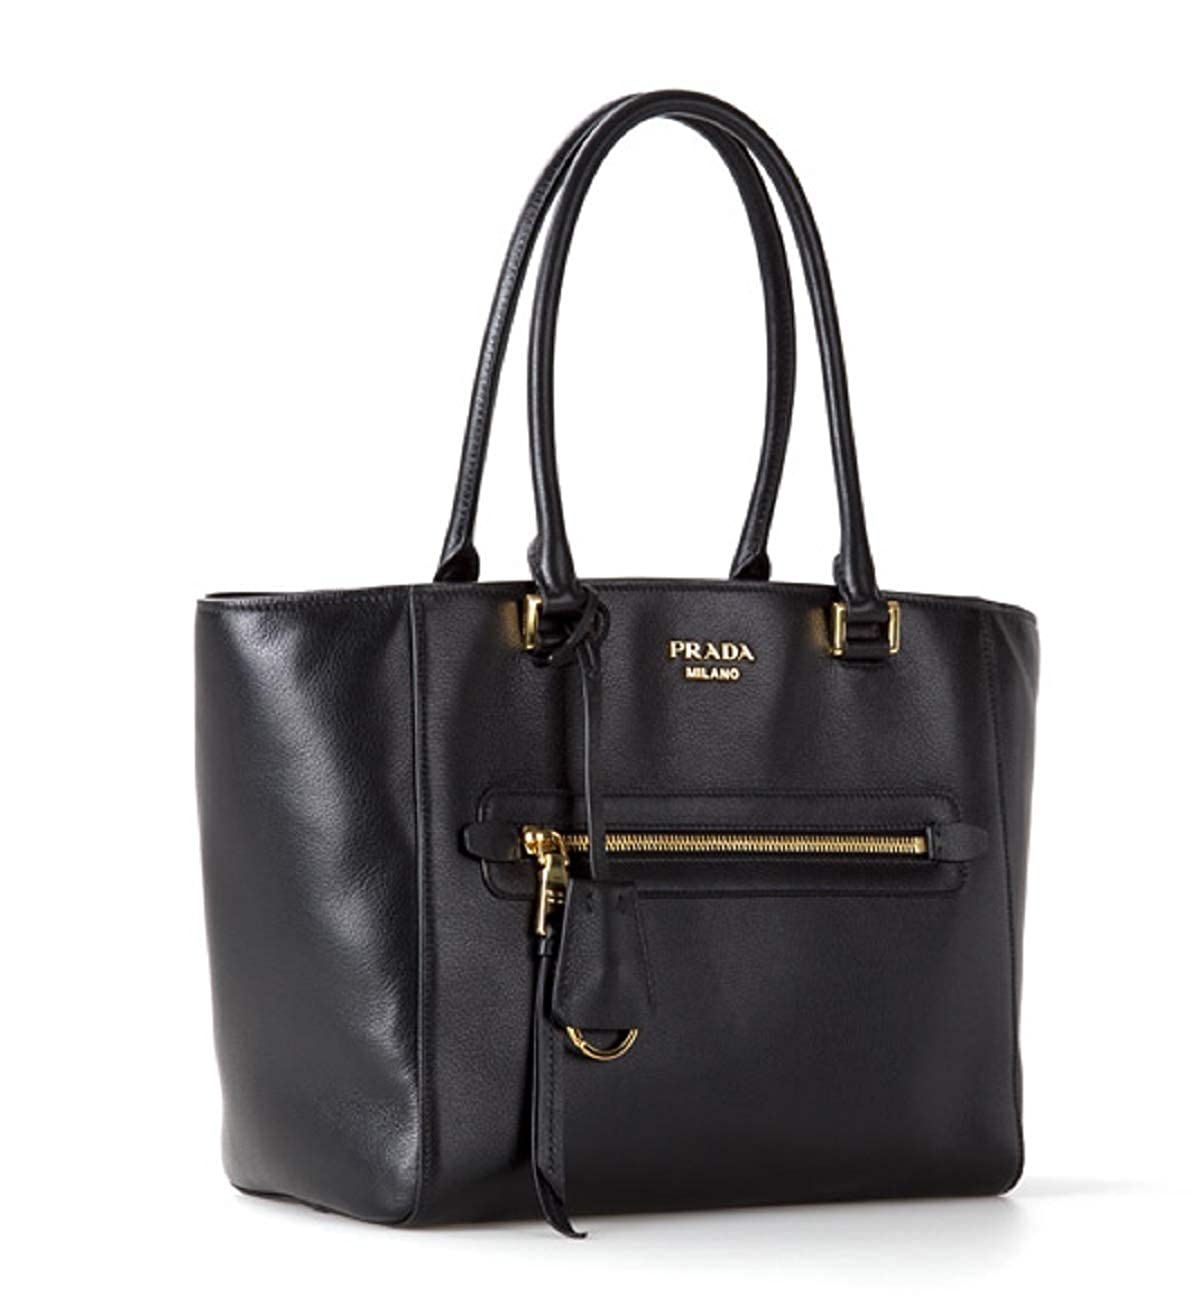 Prada Twins Pocket Black Medium Glace Calf Leather Tote Shoulder Bag  1BG227  Handbags  Amazon.com